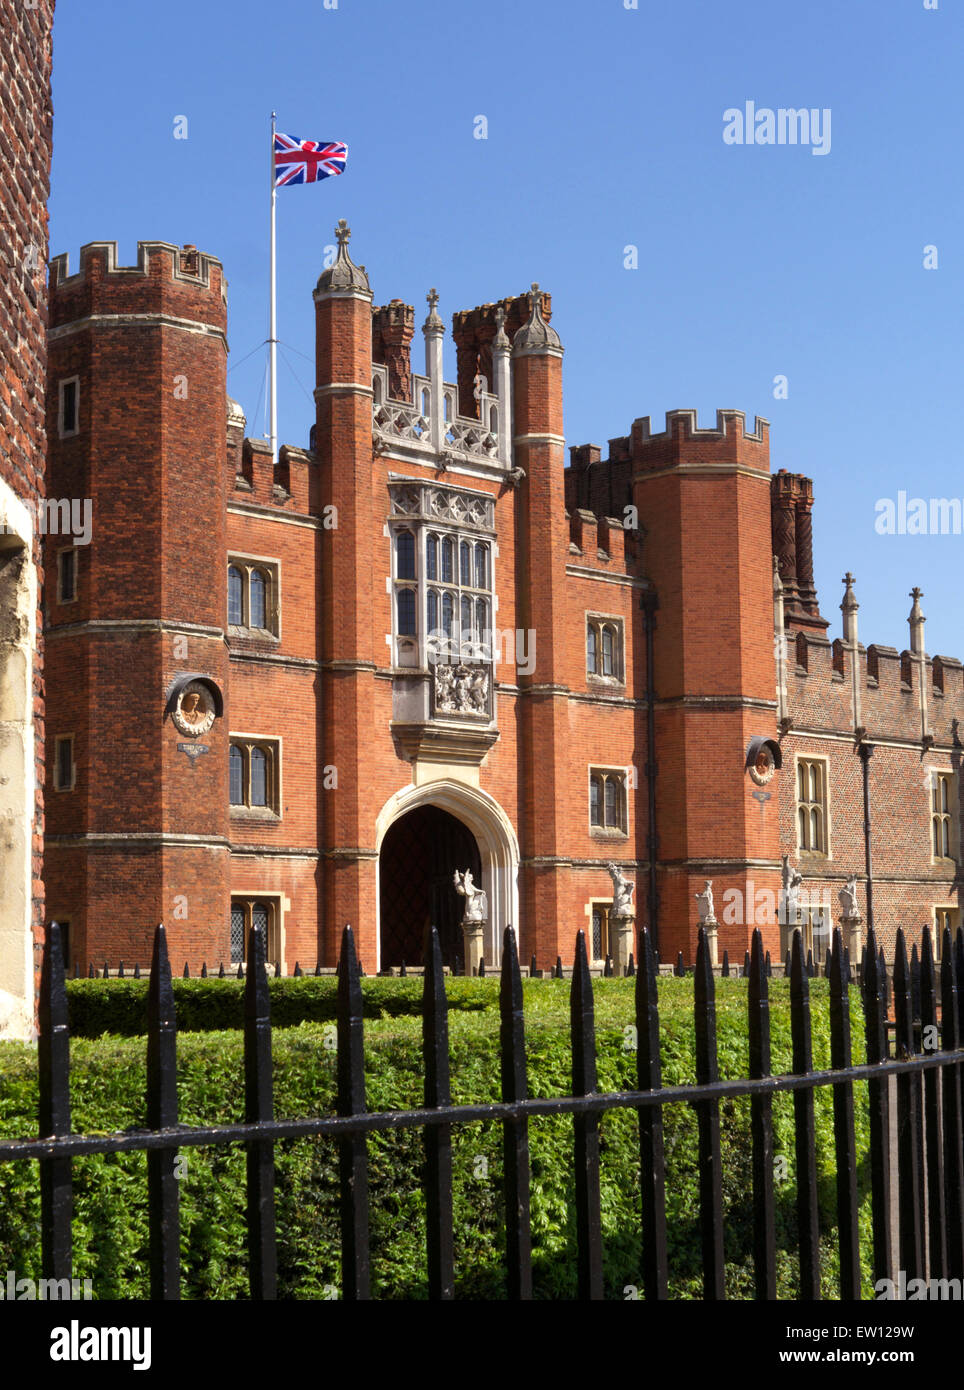 Ingresso al Palazzo di Hampton Court a Royal Palace in London Borough of Richmond upon Thames Greater London Surrey Immagini Stock